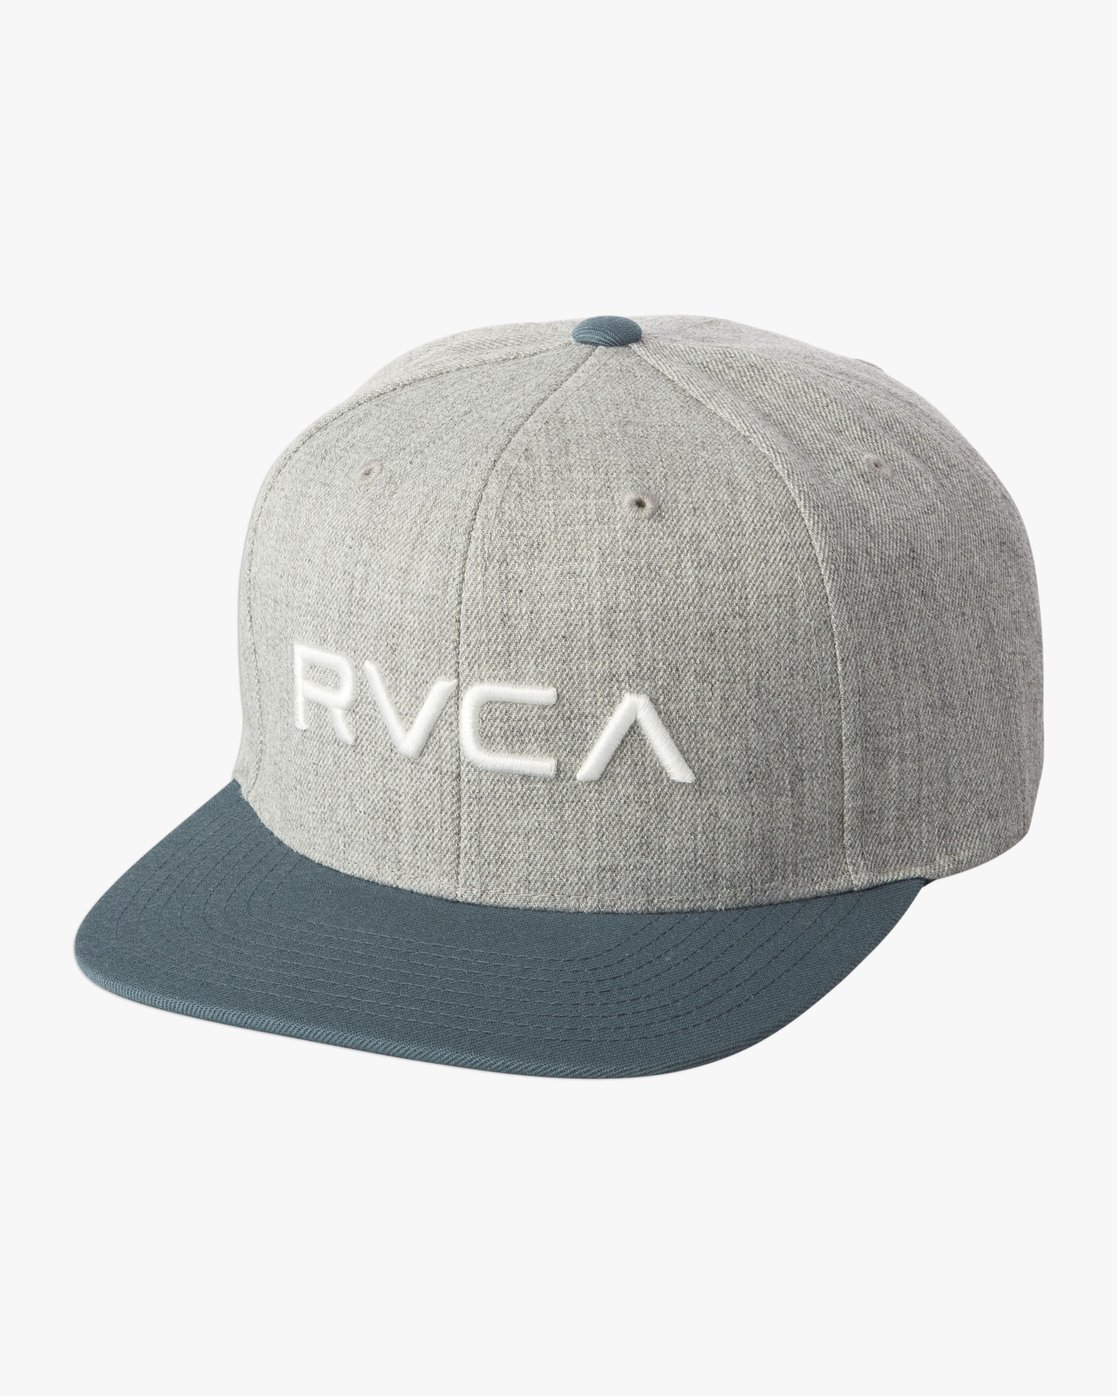 0 RVCA Twill - Snapback Hat for Men Grey Q5CPRCRVF9 RVCA